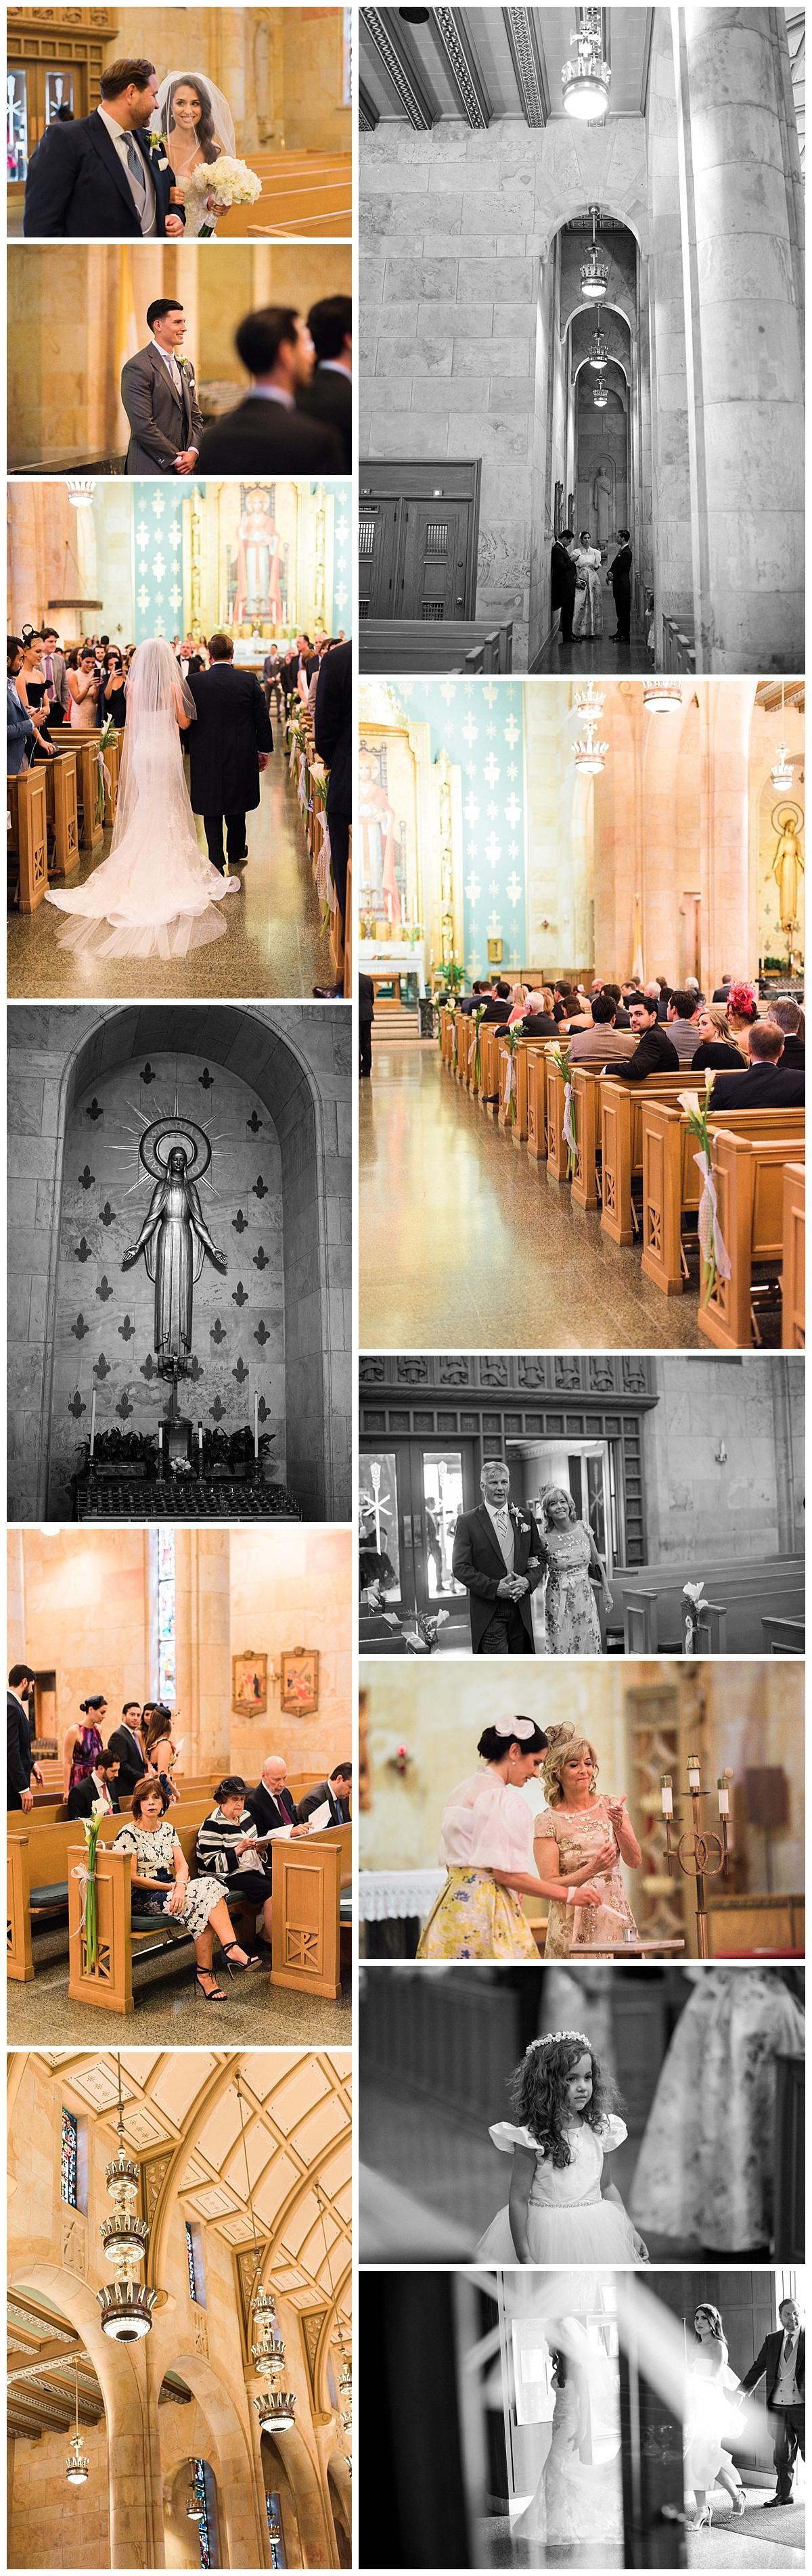 christ-the-king-catholic-church-wedding-ar-photography-4.jpg